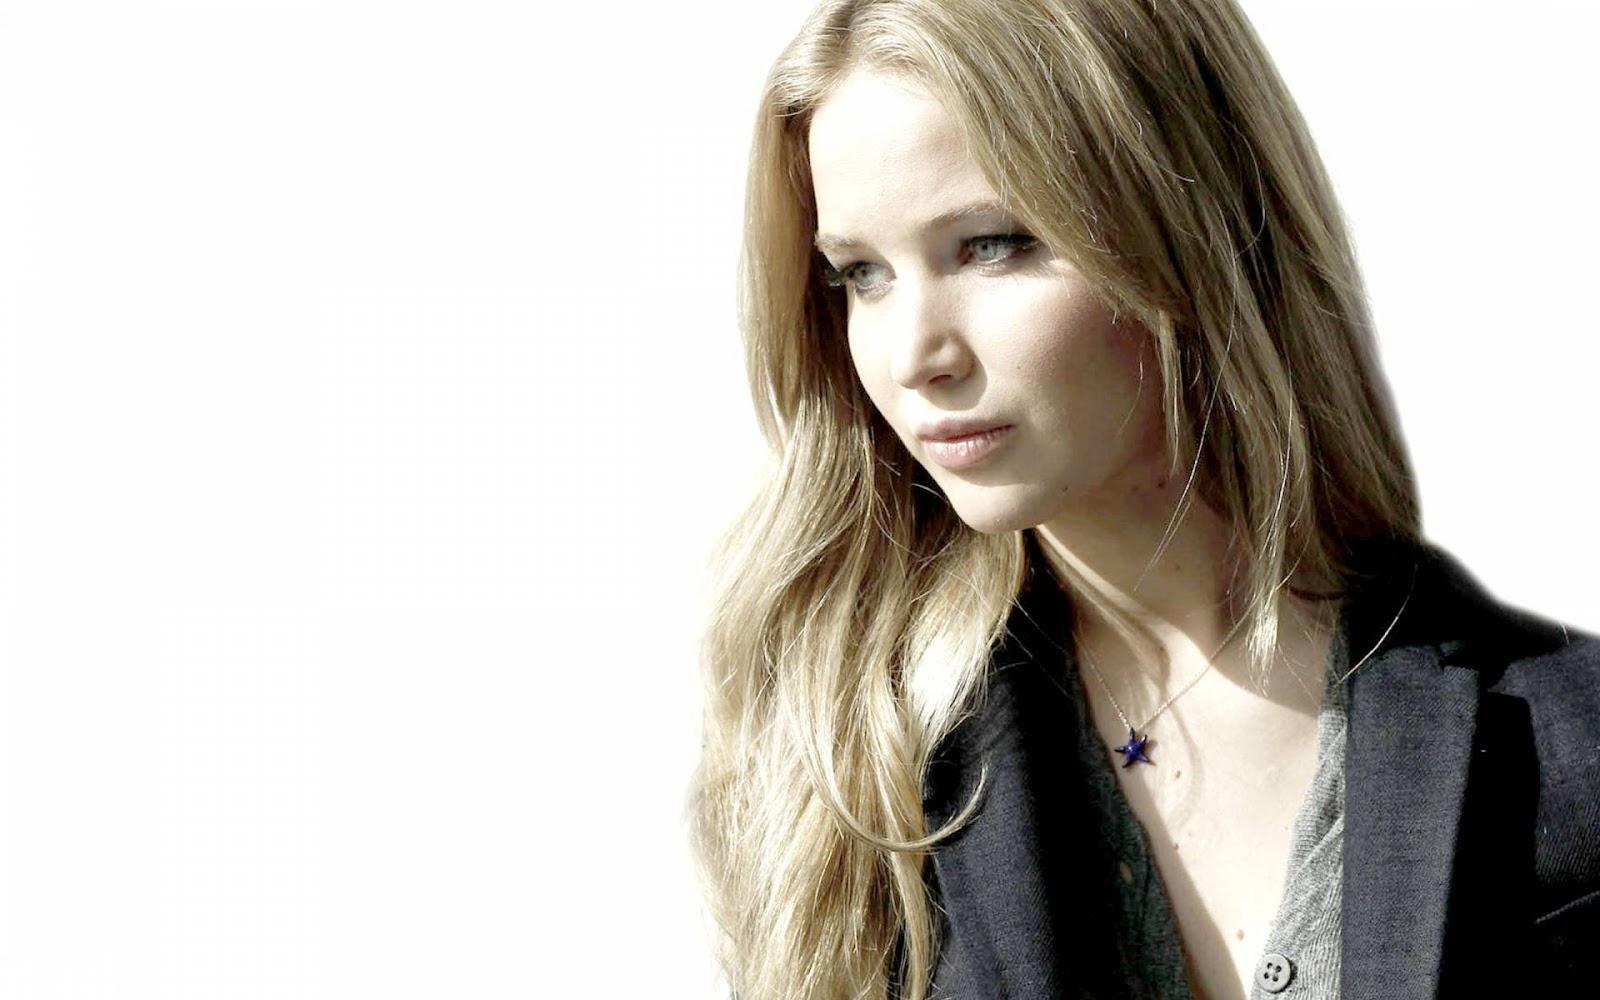 Jennifer Lawrence Hot Hd Photos  Wallpaper - Hd Images -5961